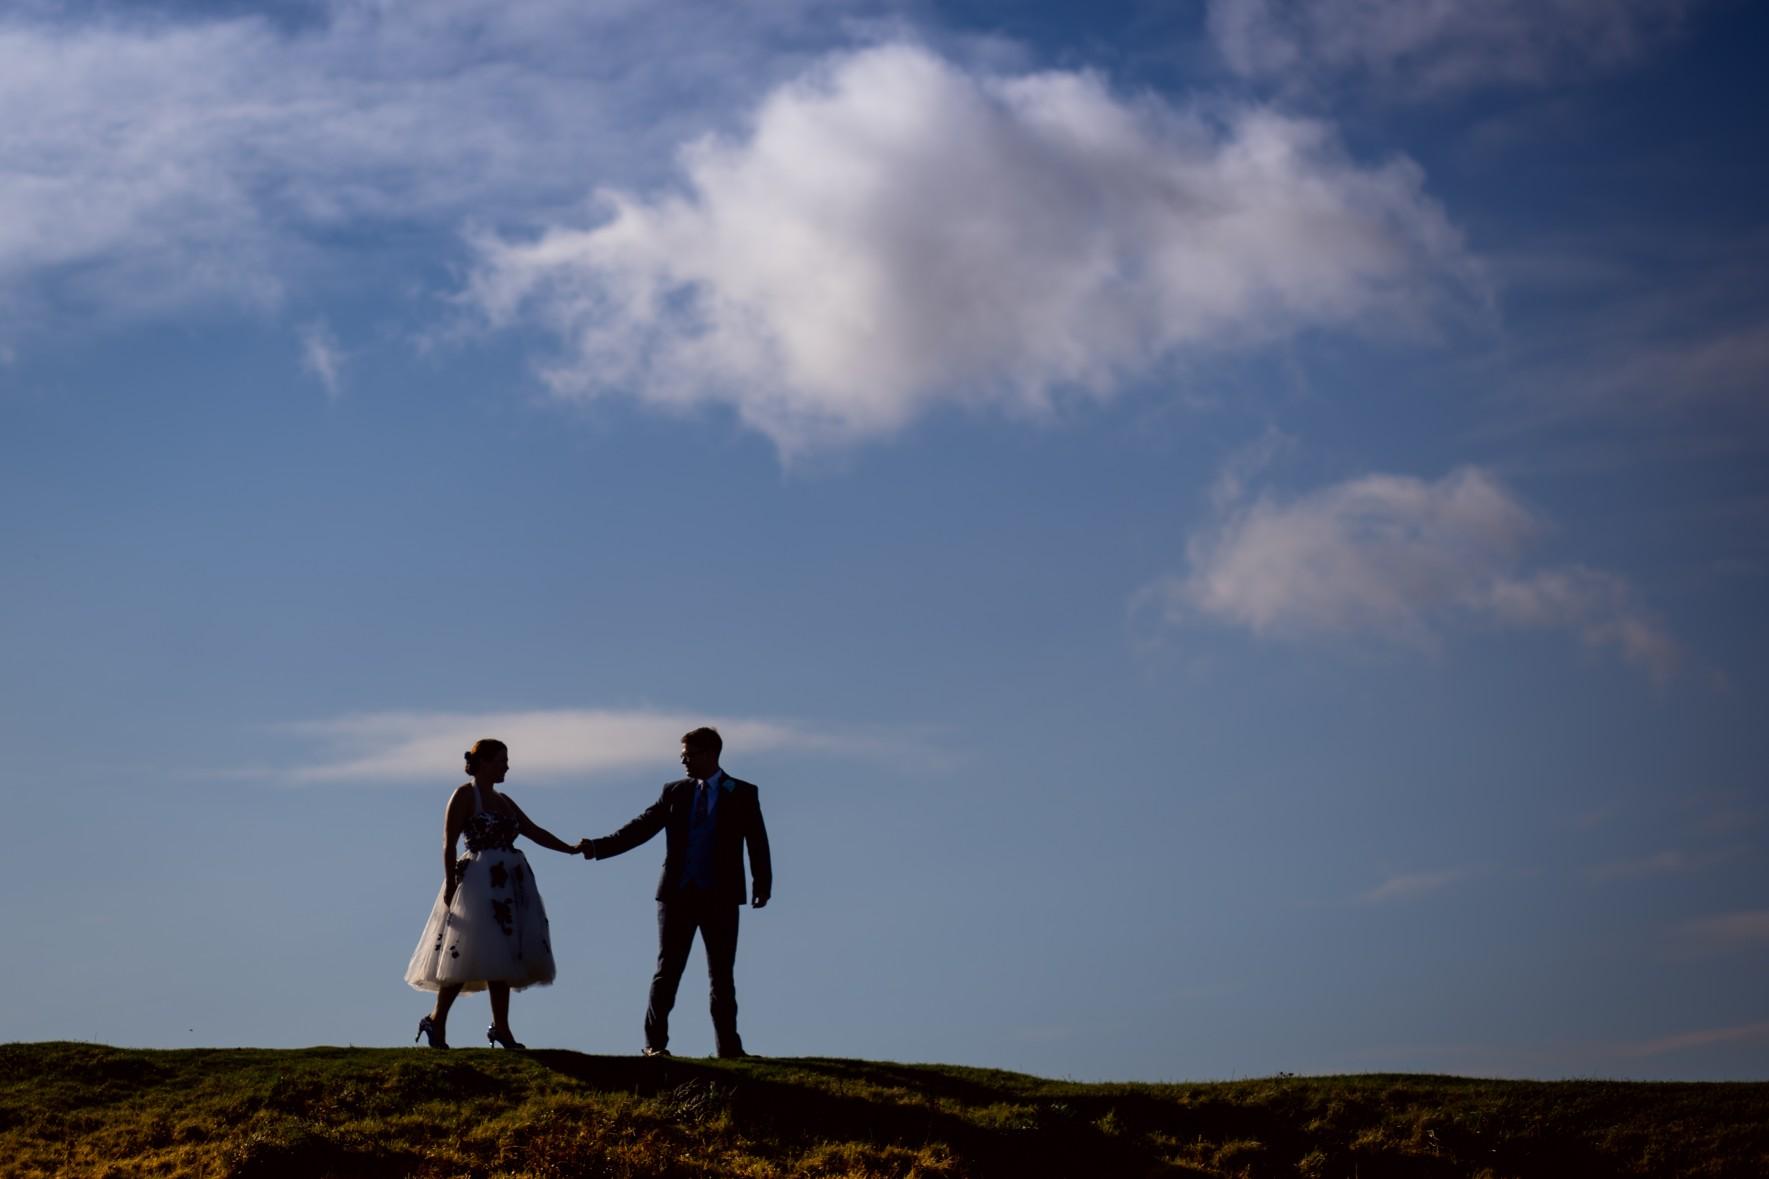 alternative wedding photography - creative wedding photography - artistic wedding photography - unconventional wedding